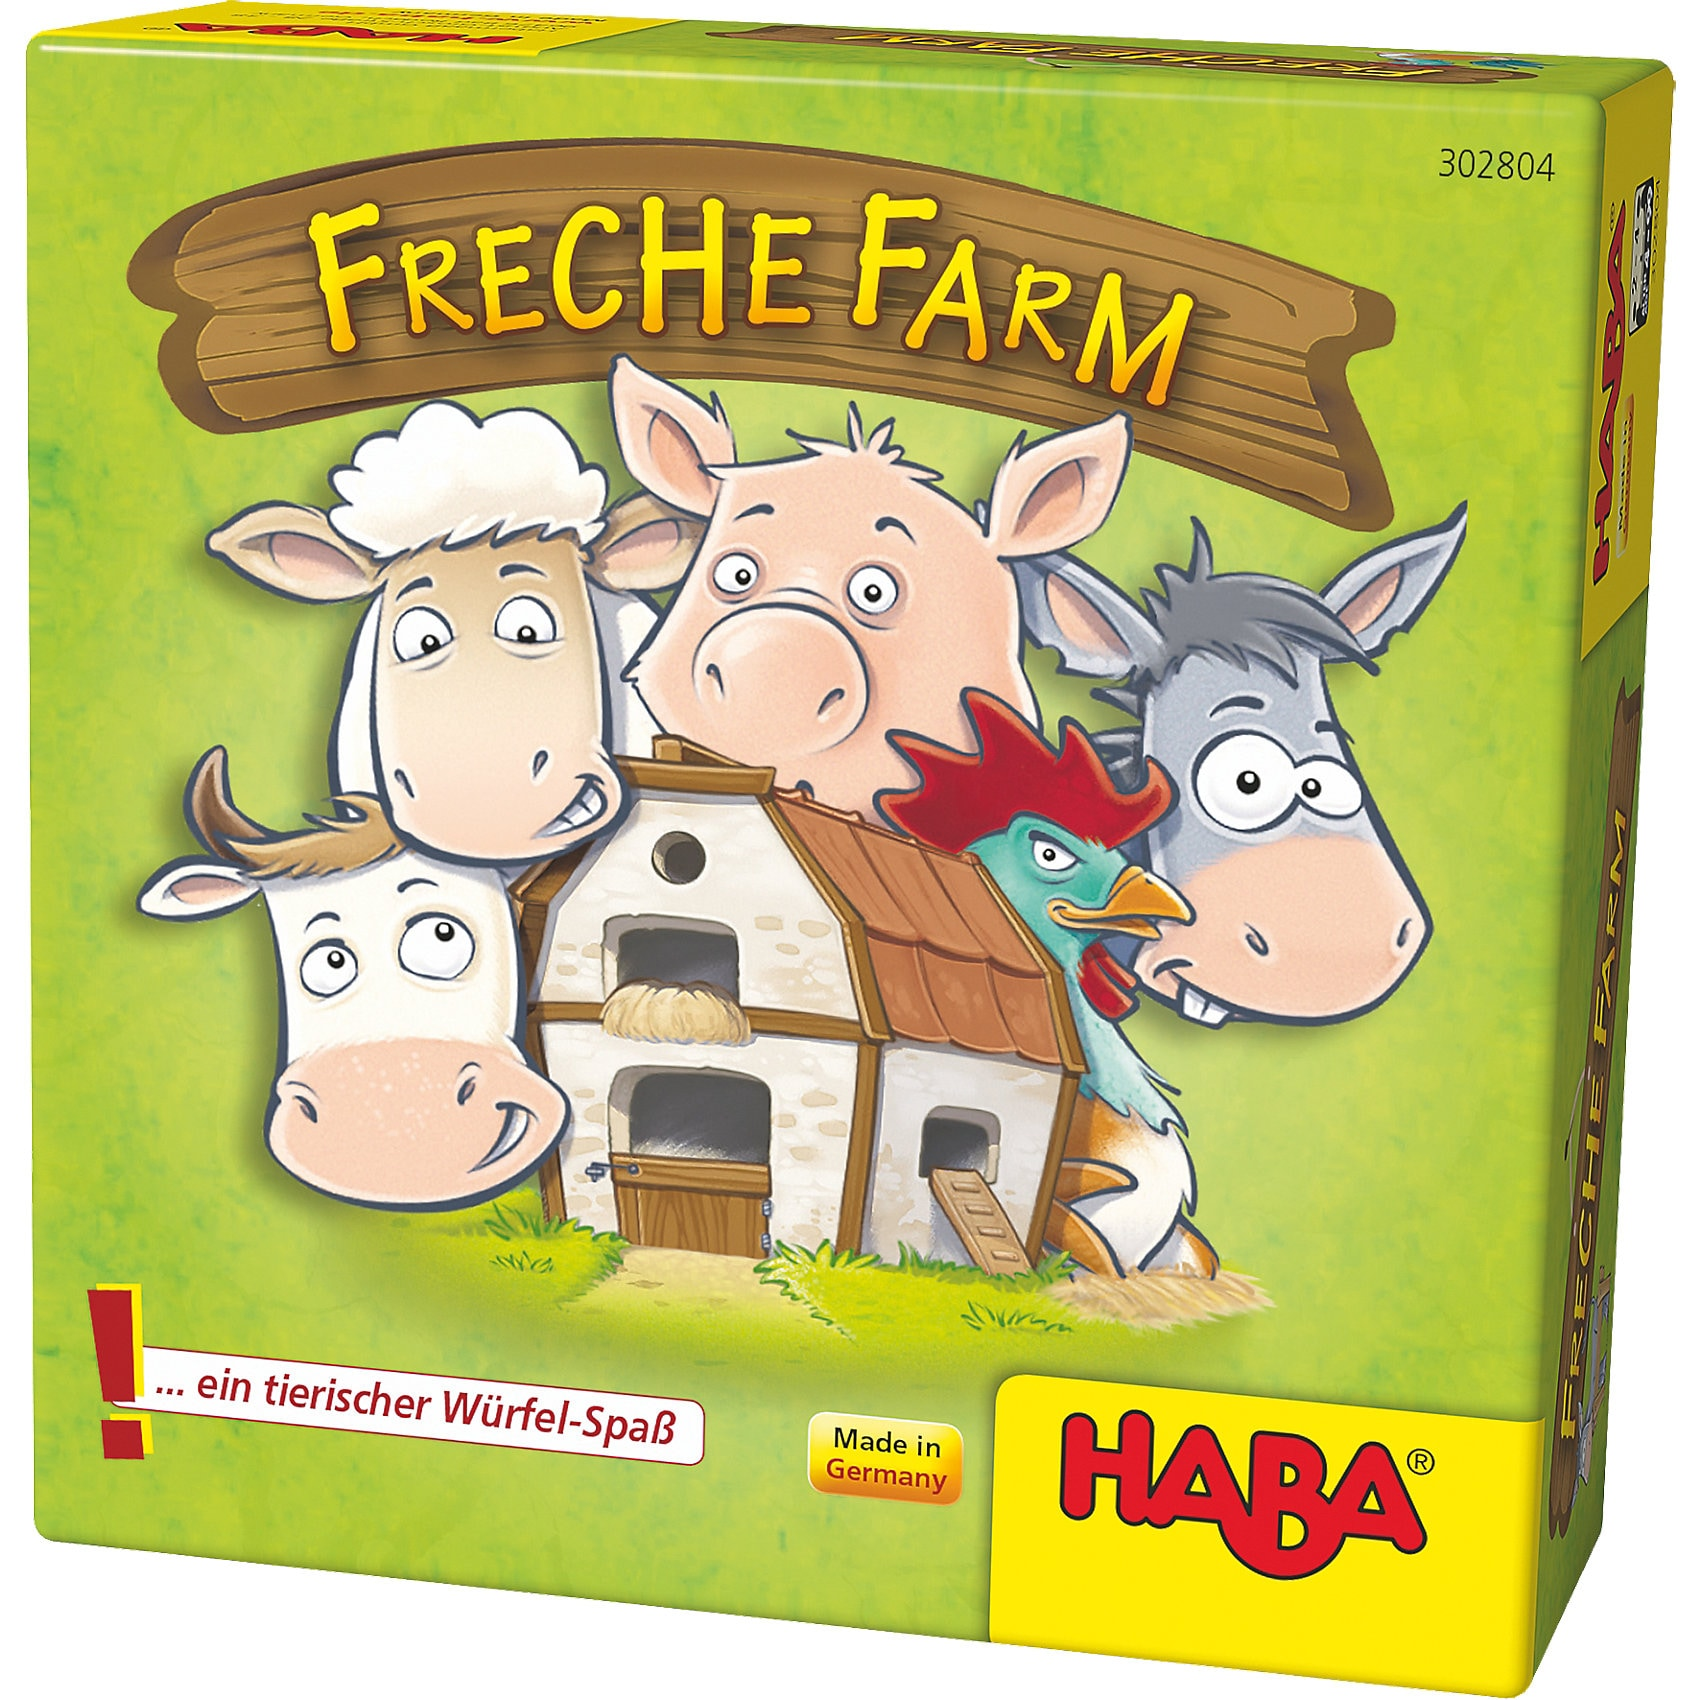 Haba Freche Farm